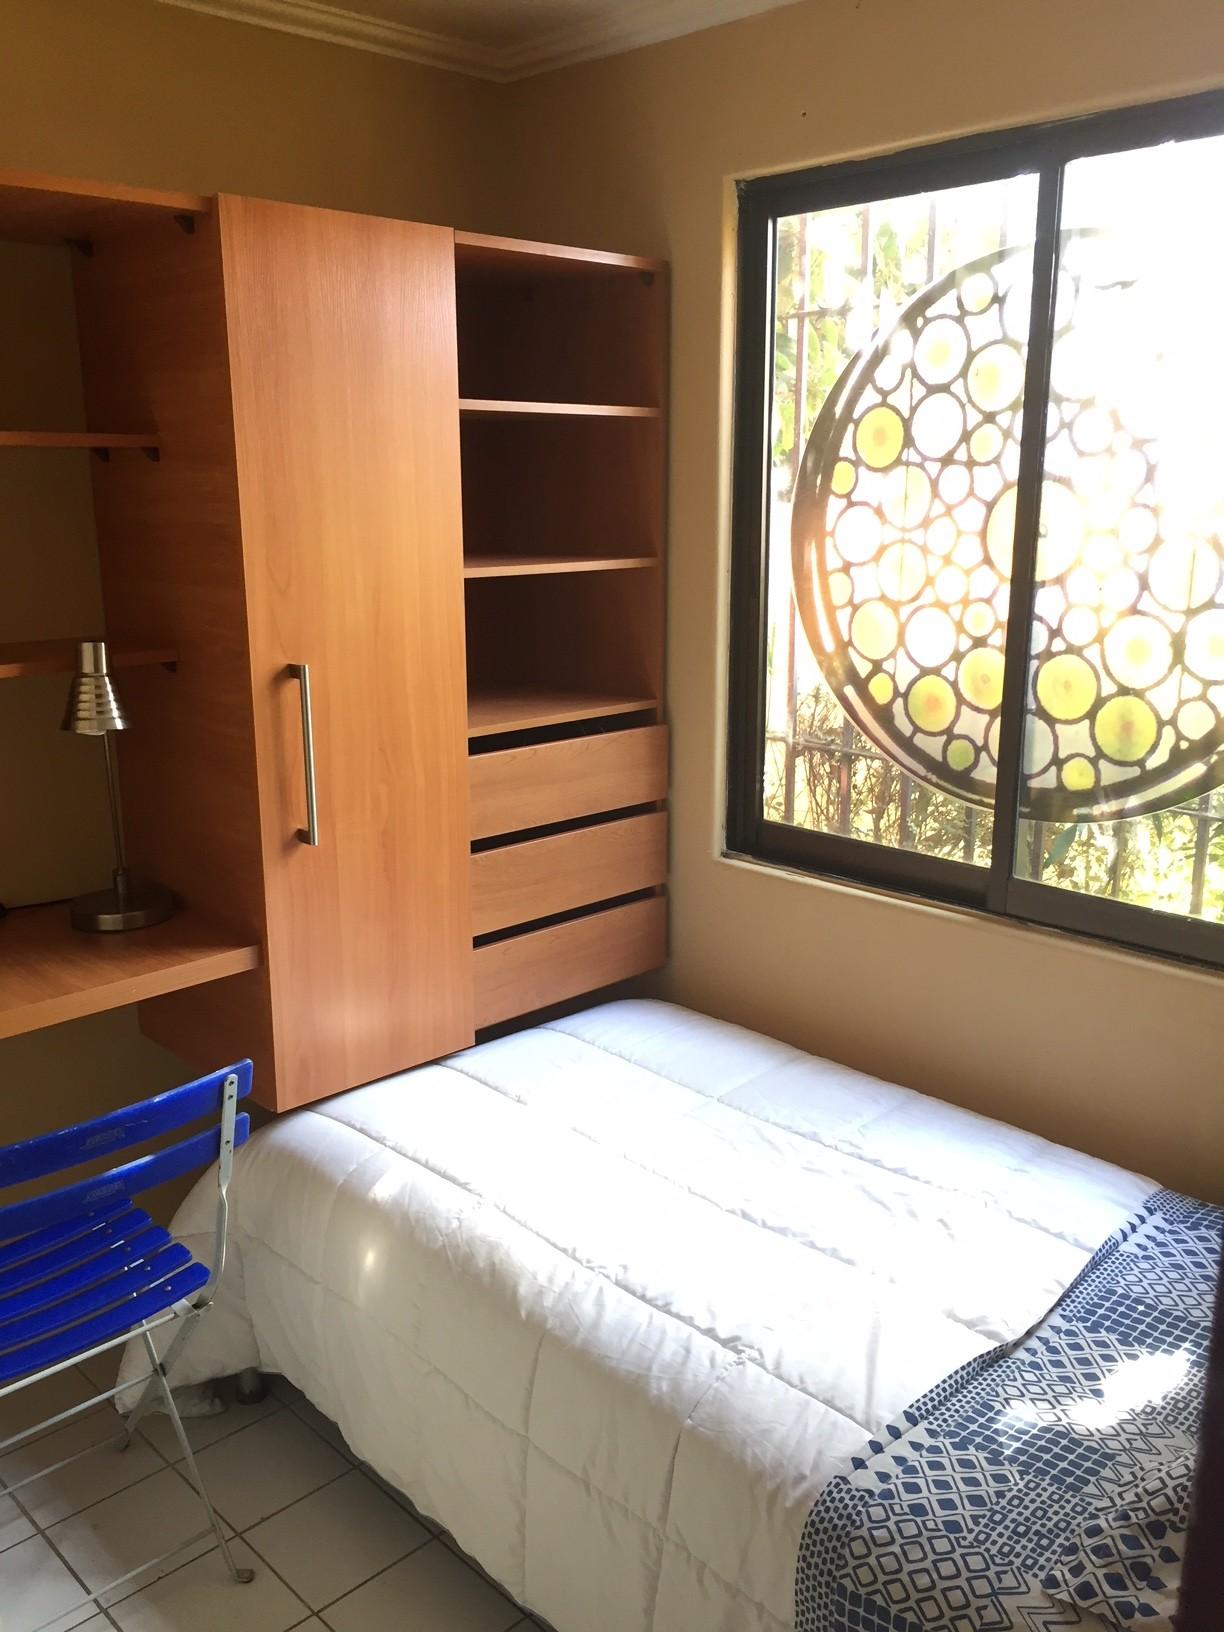 habitacion-amueblada-bano-privado-incluye-desayuno-accommodation-with-furnished-room-and-private-bathroom-breakfast-181311b49fe937a2334c695bd0da632a